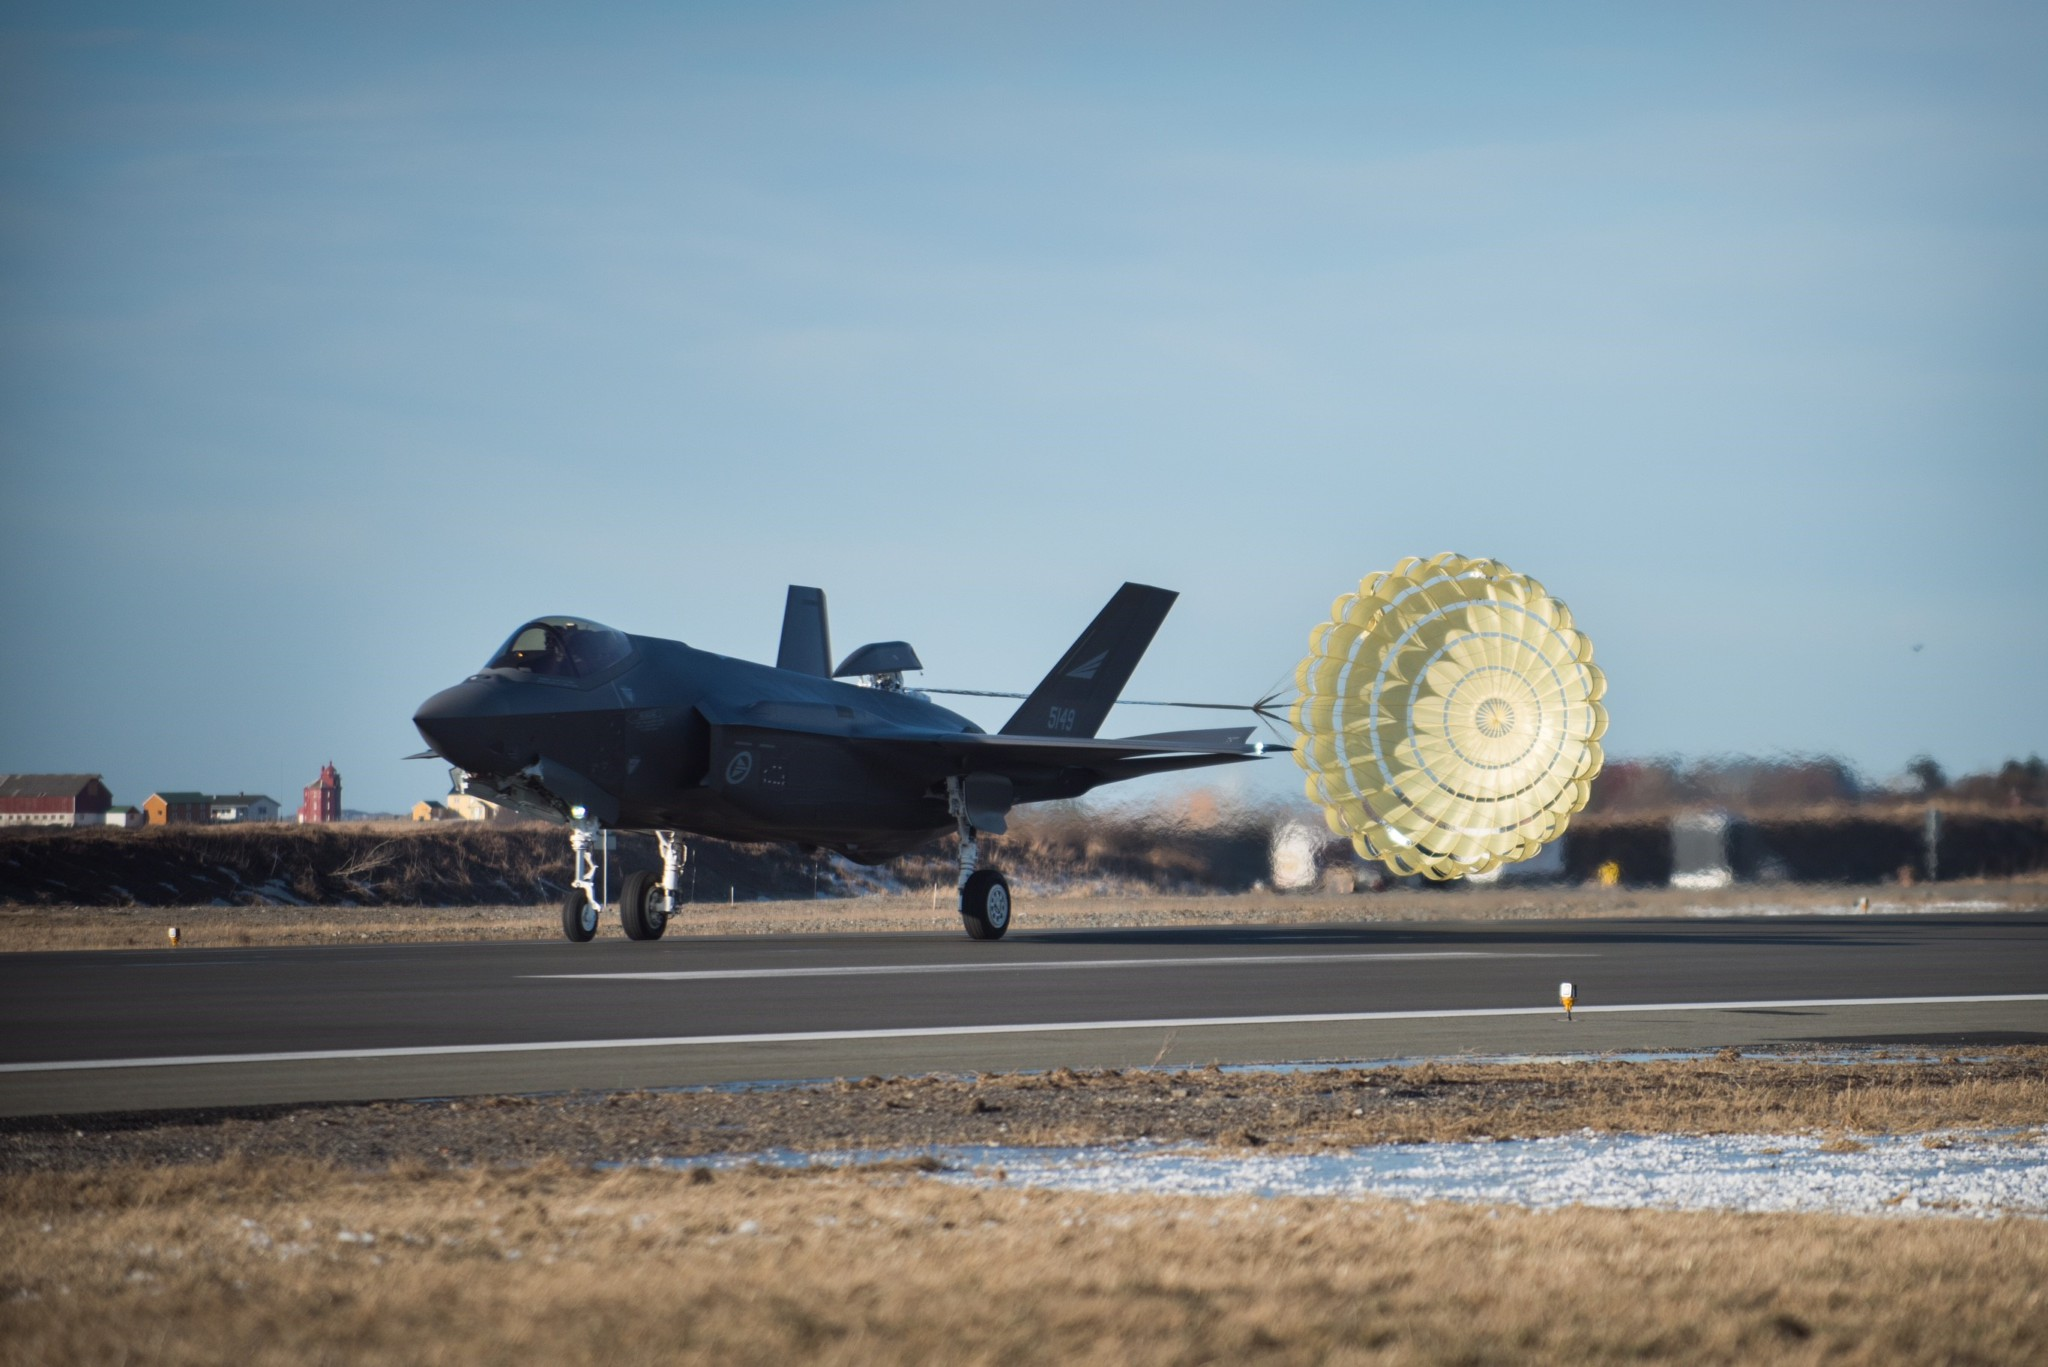 F-35 testet med bremseskjerm